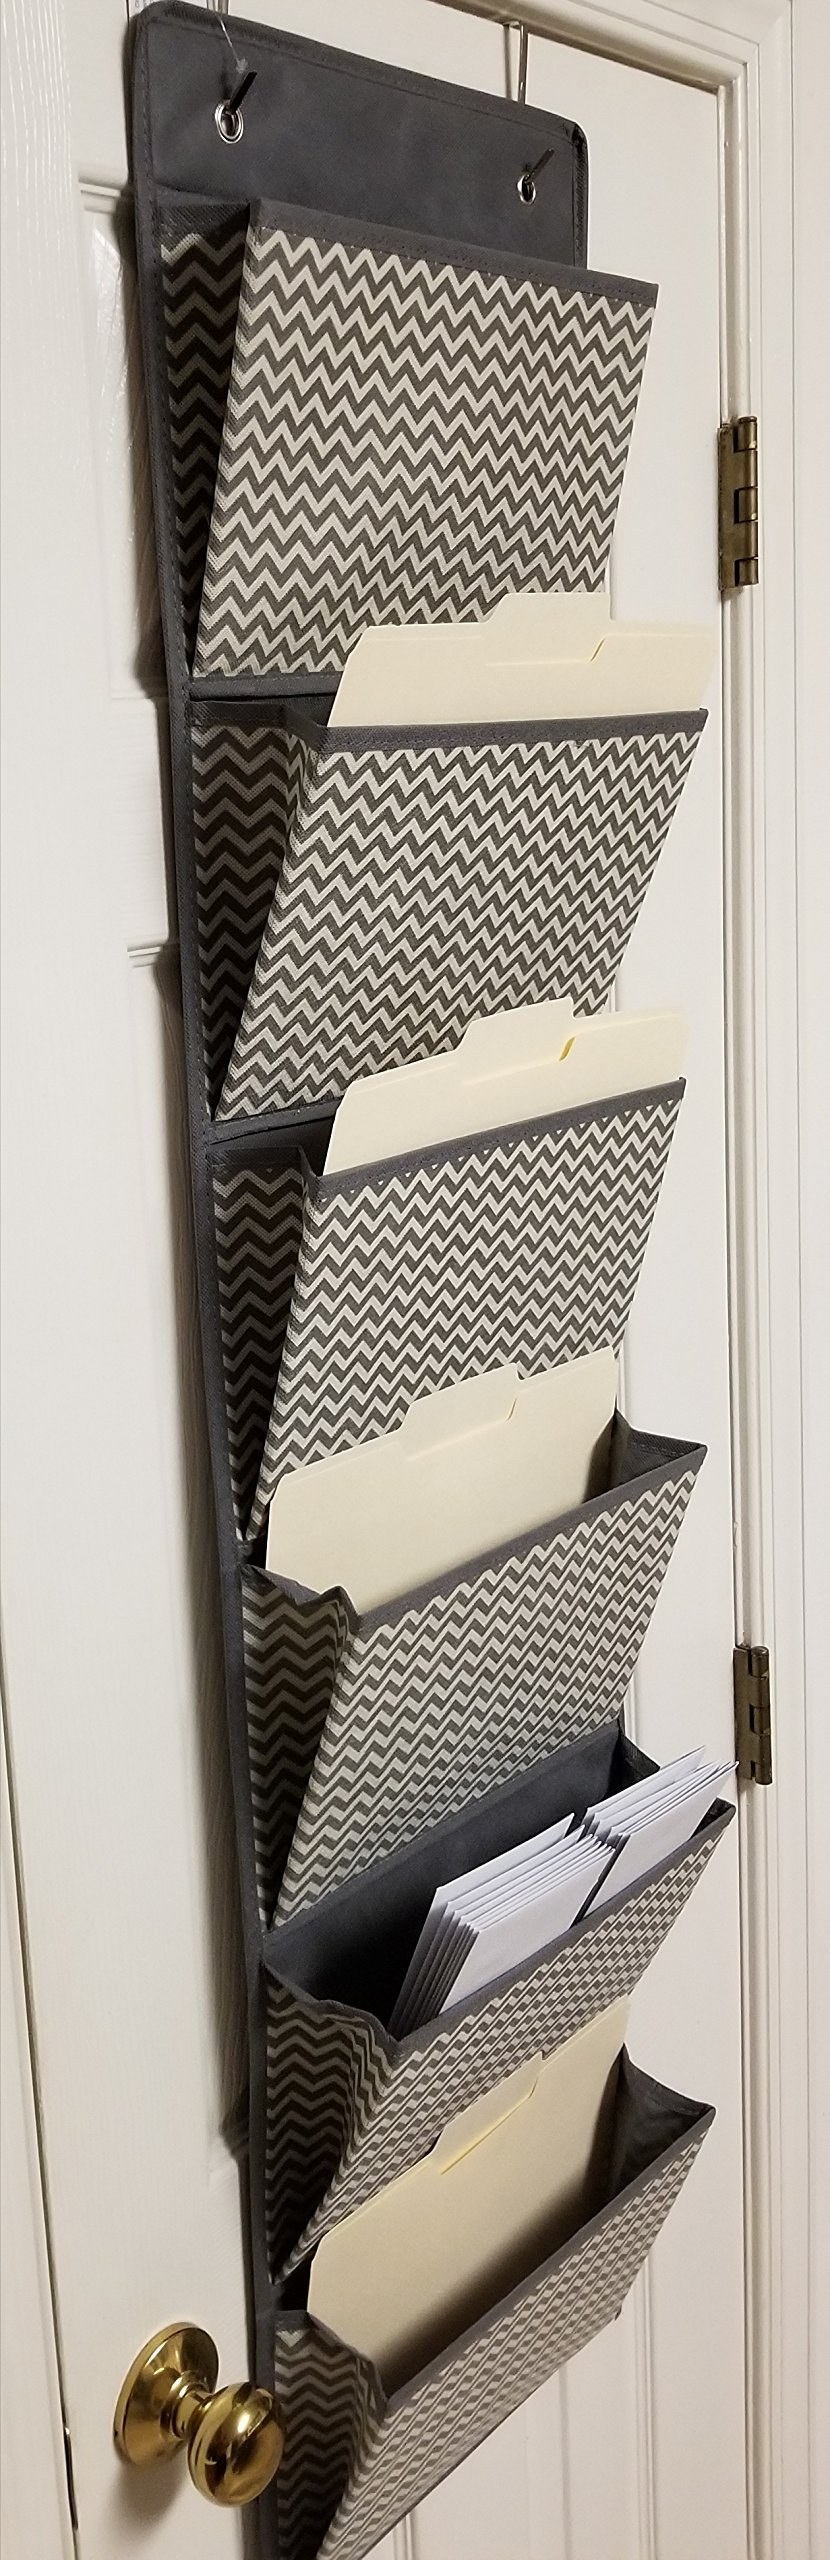 B4 Supplies Wall Mount Hanging Organizer, Office Supplies Storage Organizer for Notebooks, File Folder - 6 Pockets